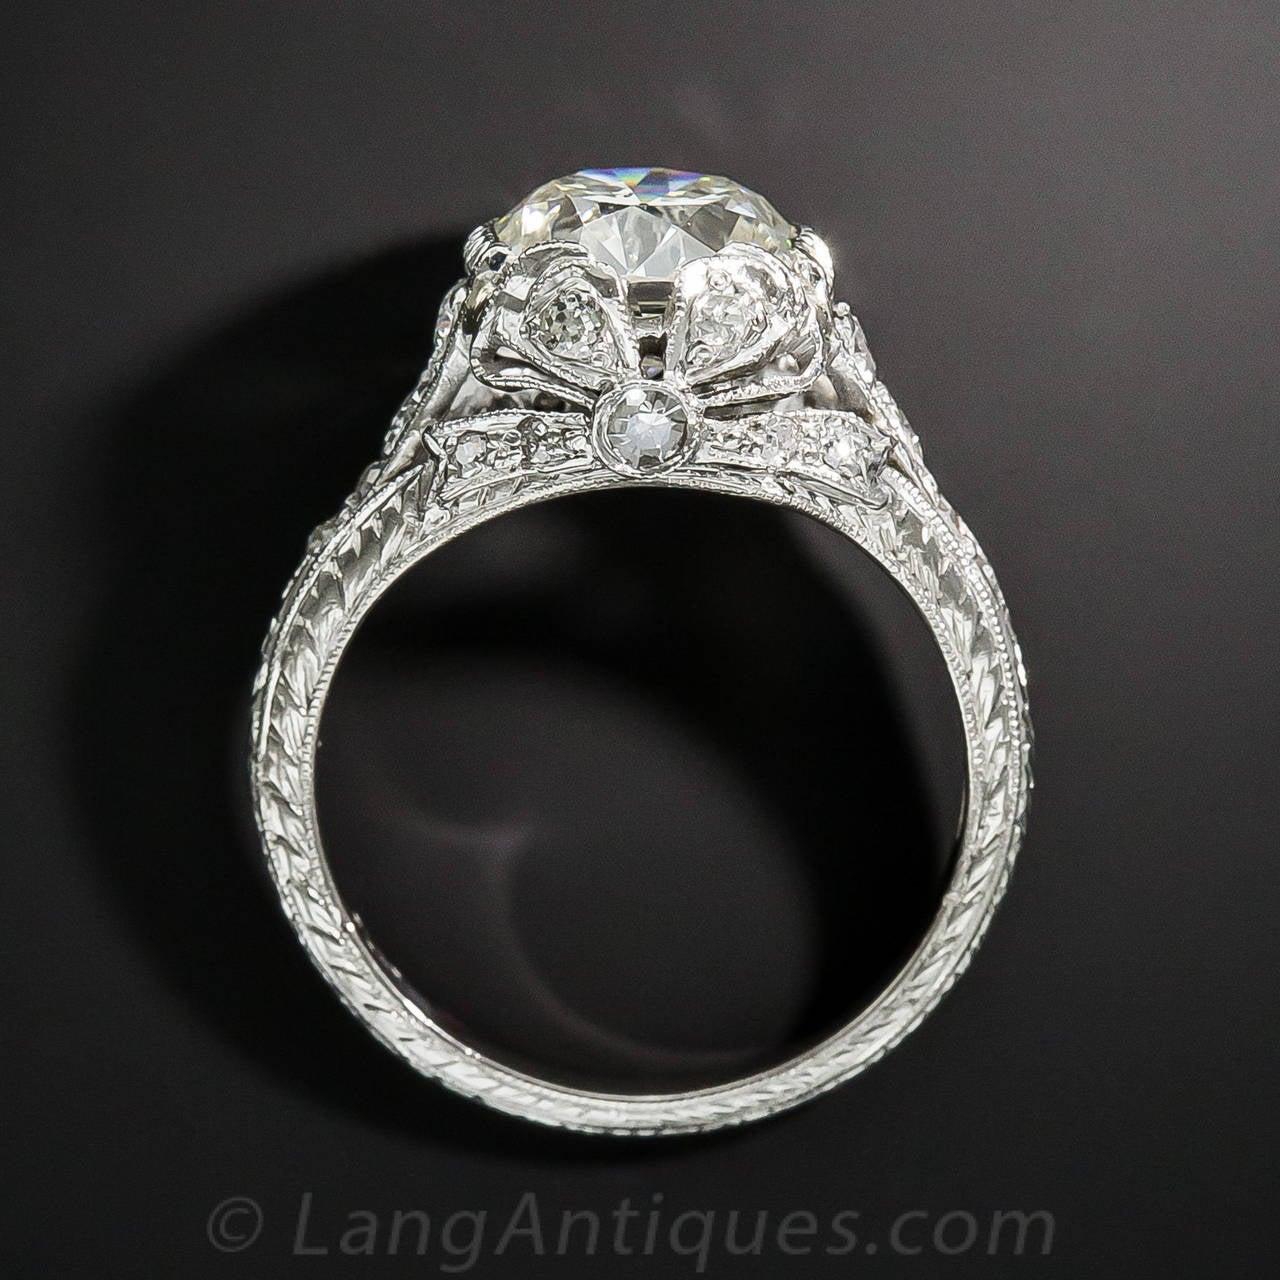 Edwardian GIA Cert 2.09 Carat Diamond Platinum Ring For Sale 1